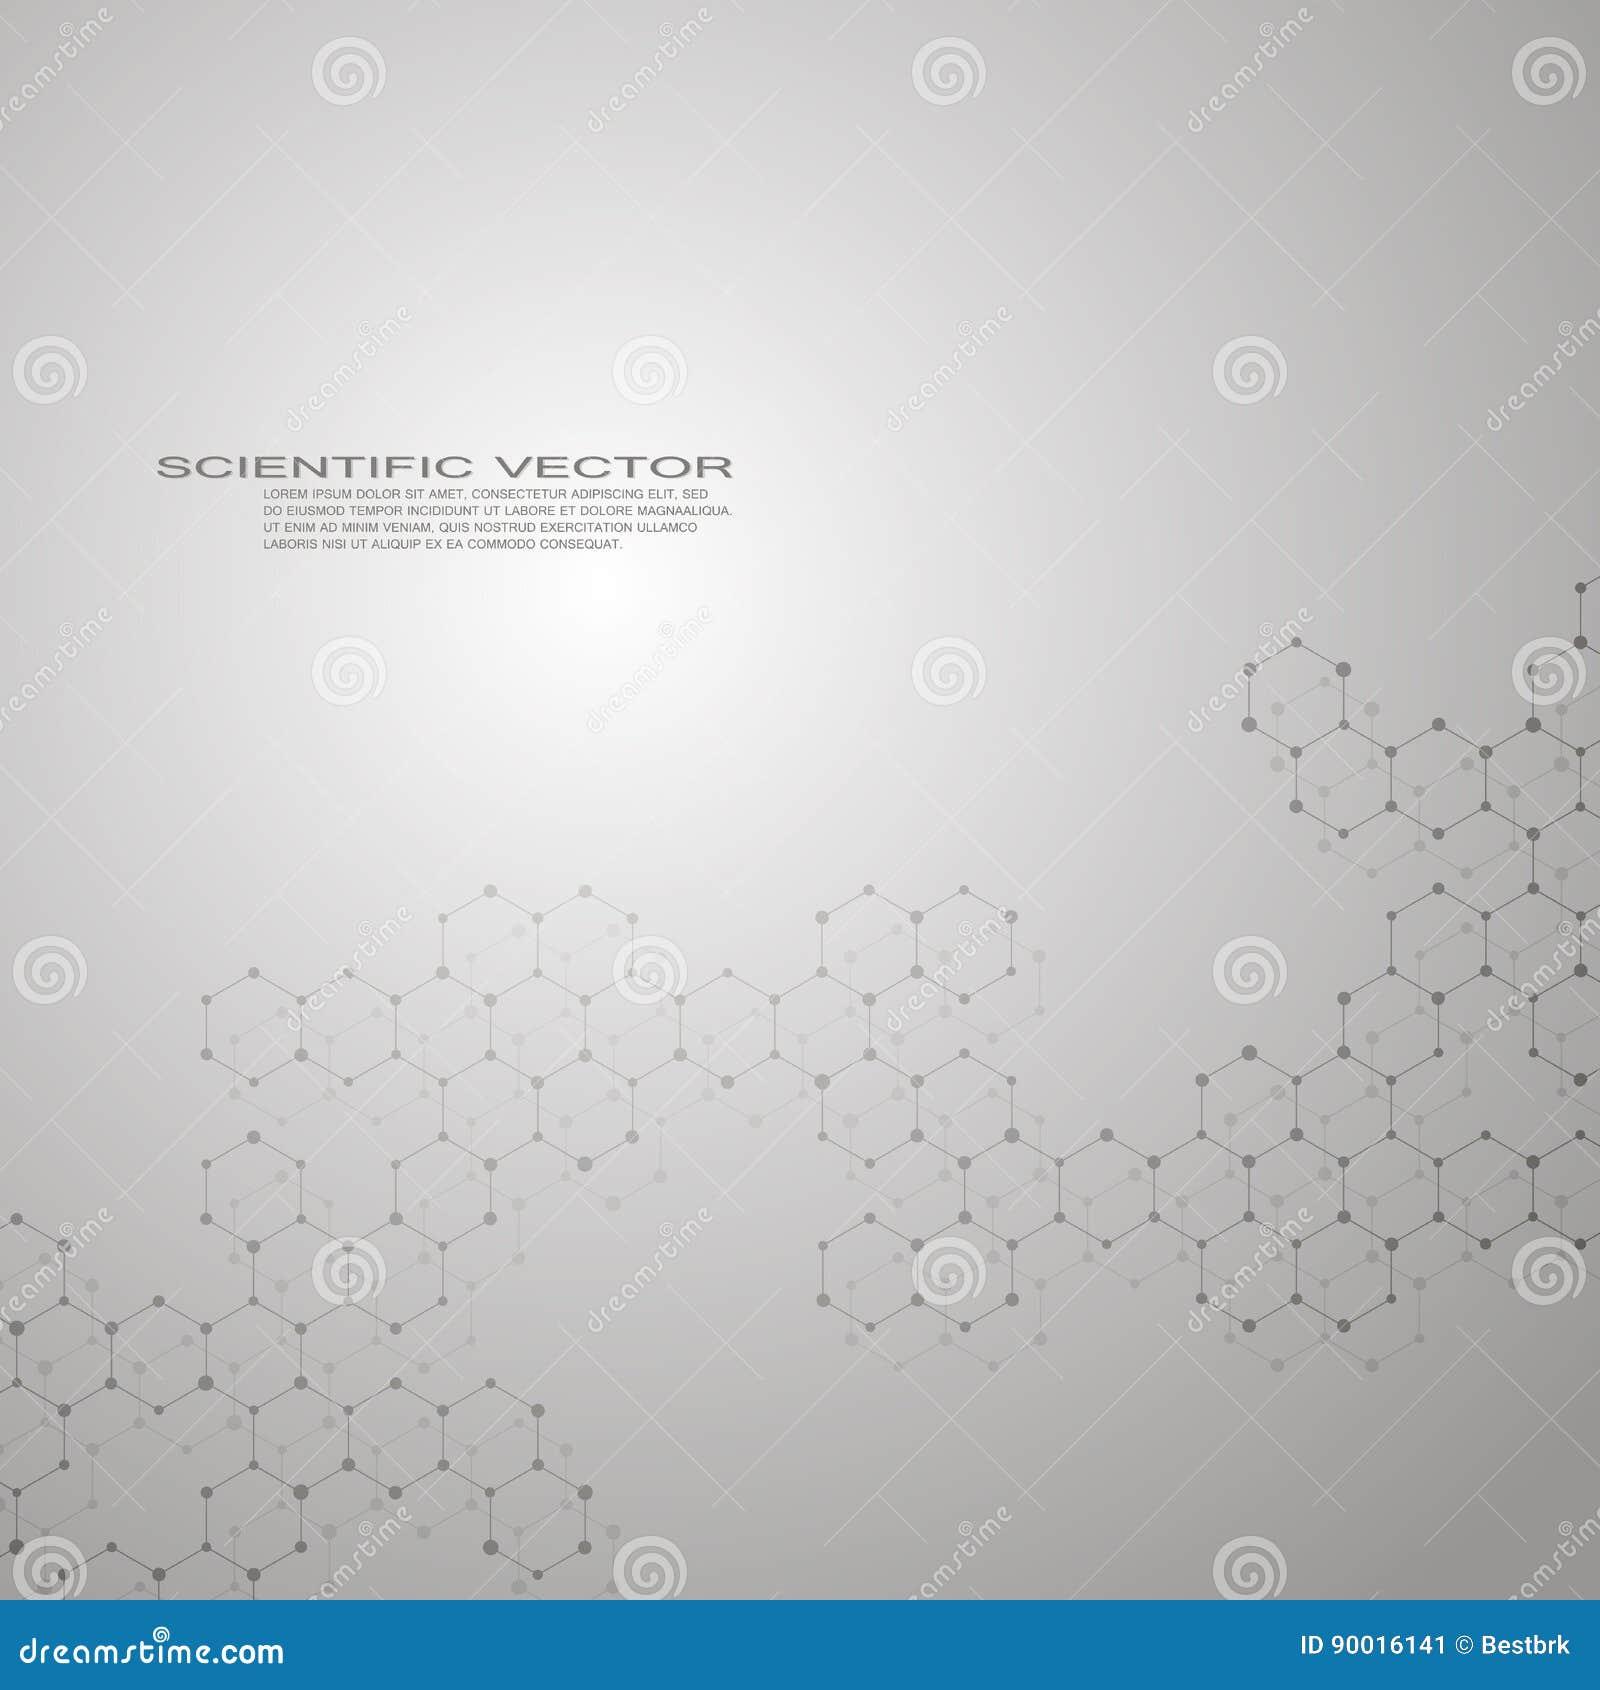 Sechseckige Molekül Dna Molekülstruktur Des Neuronsystems